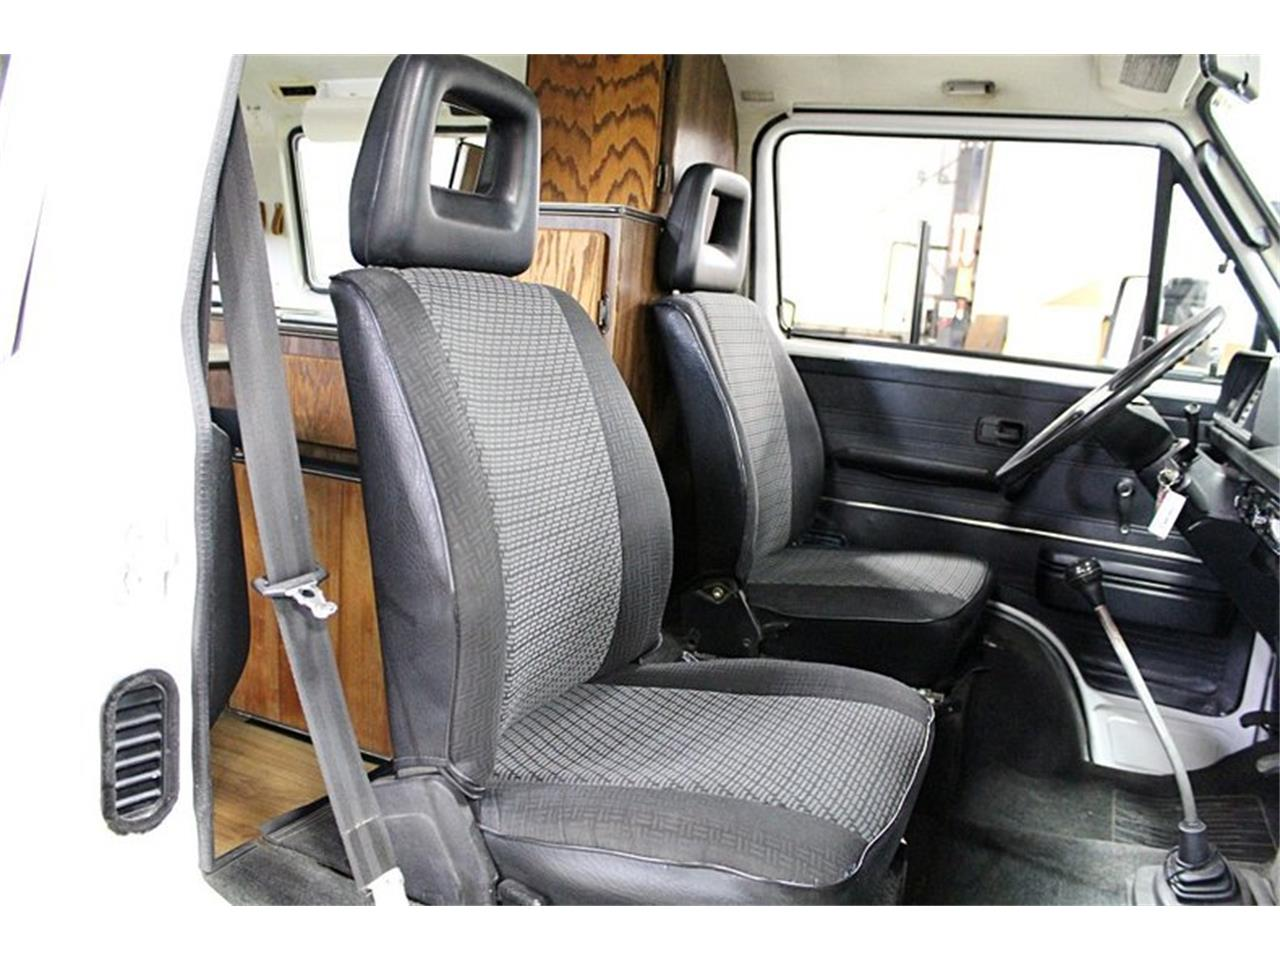 Large Picture of 1983 Volkswagen Van located in Michigan - $24,900.00 - PPV8